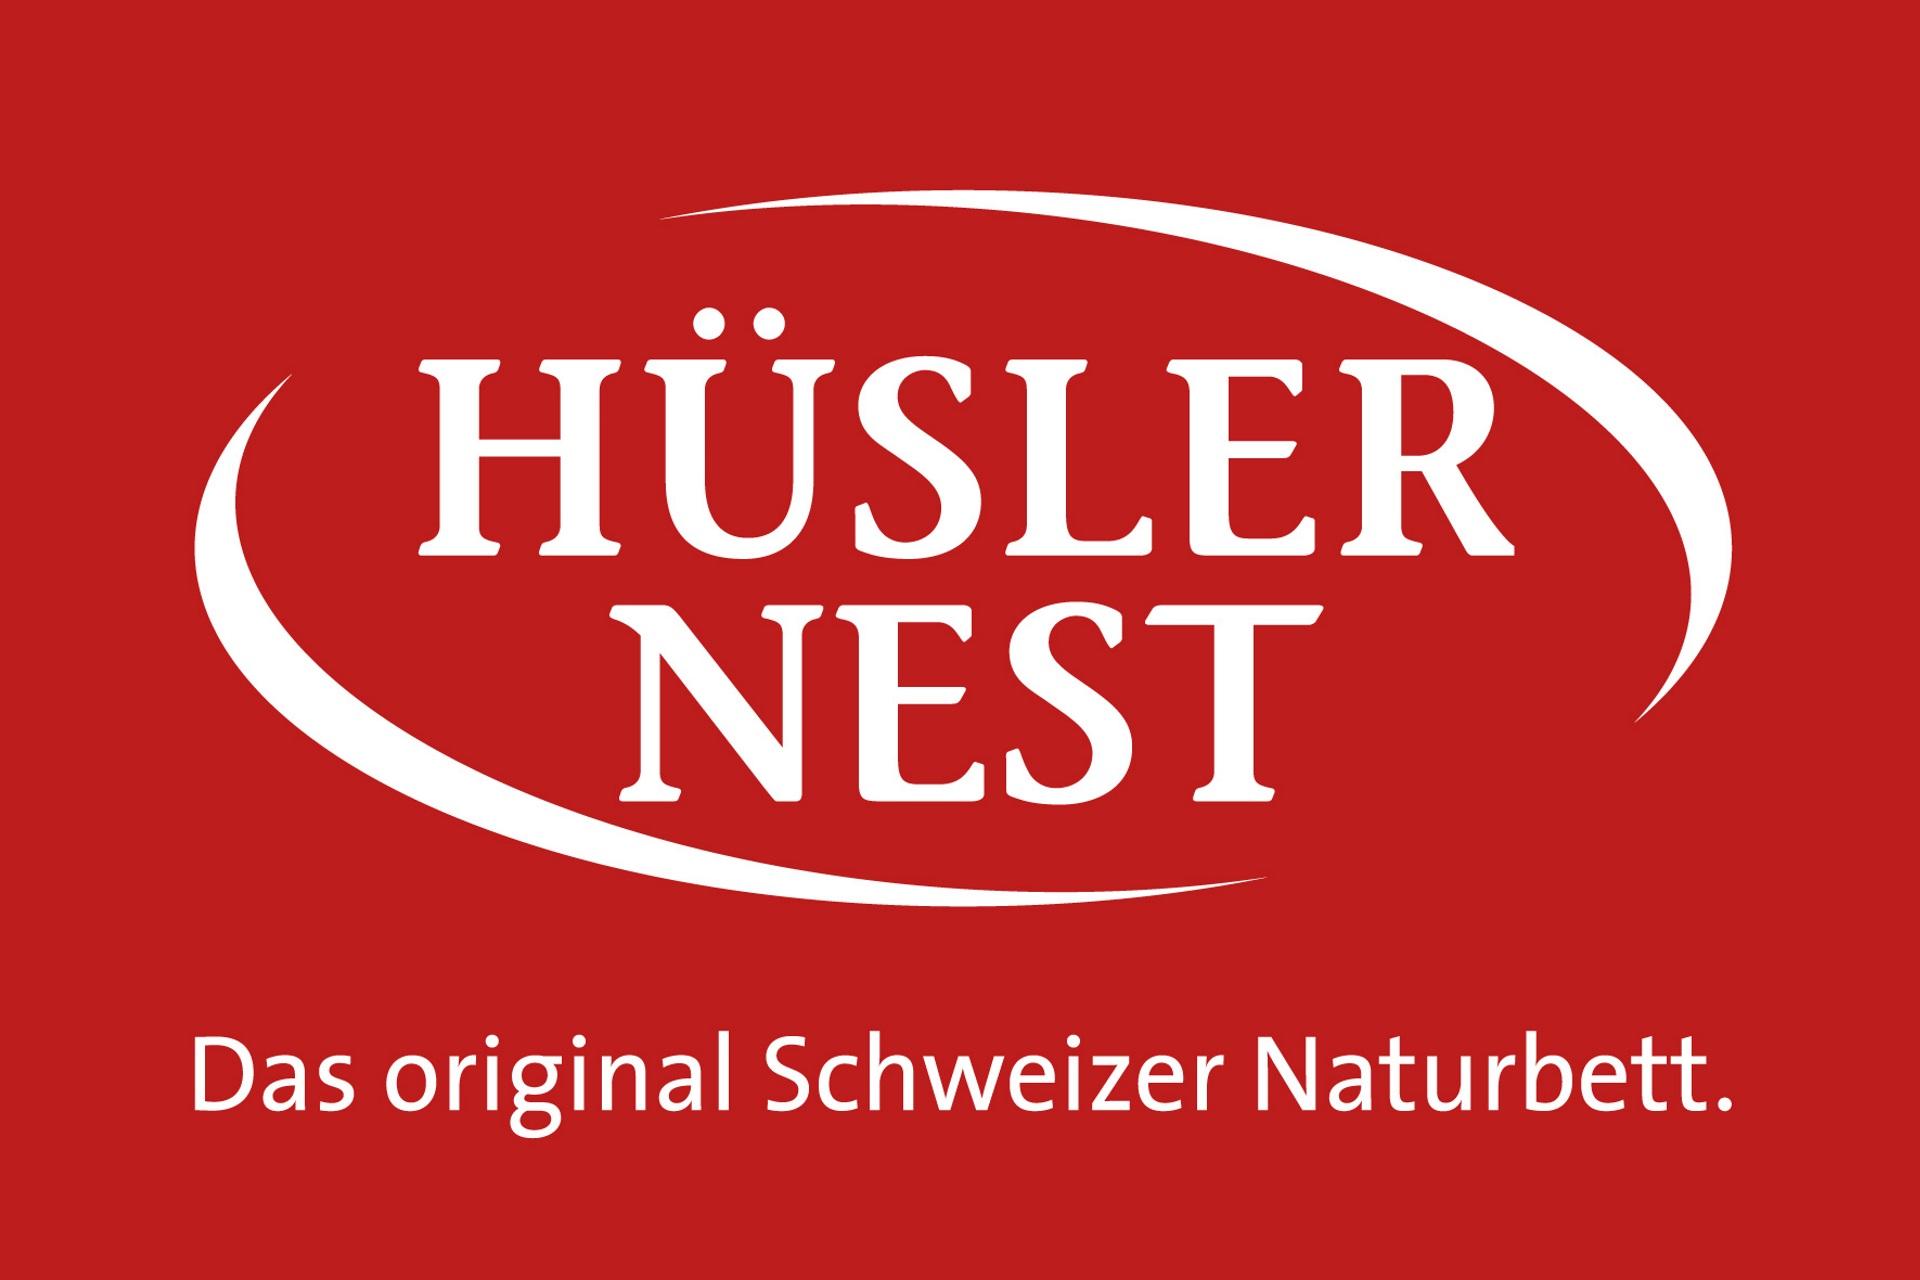 Logo des Original Schweizer Naturbettsystems Hüsler Nest